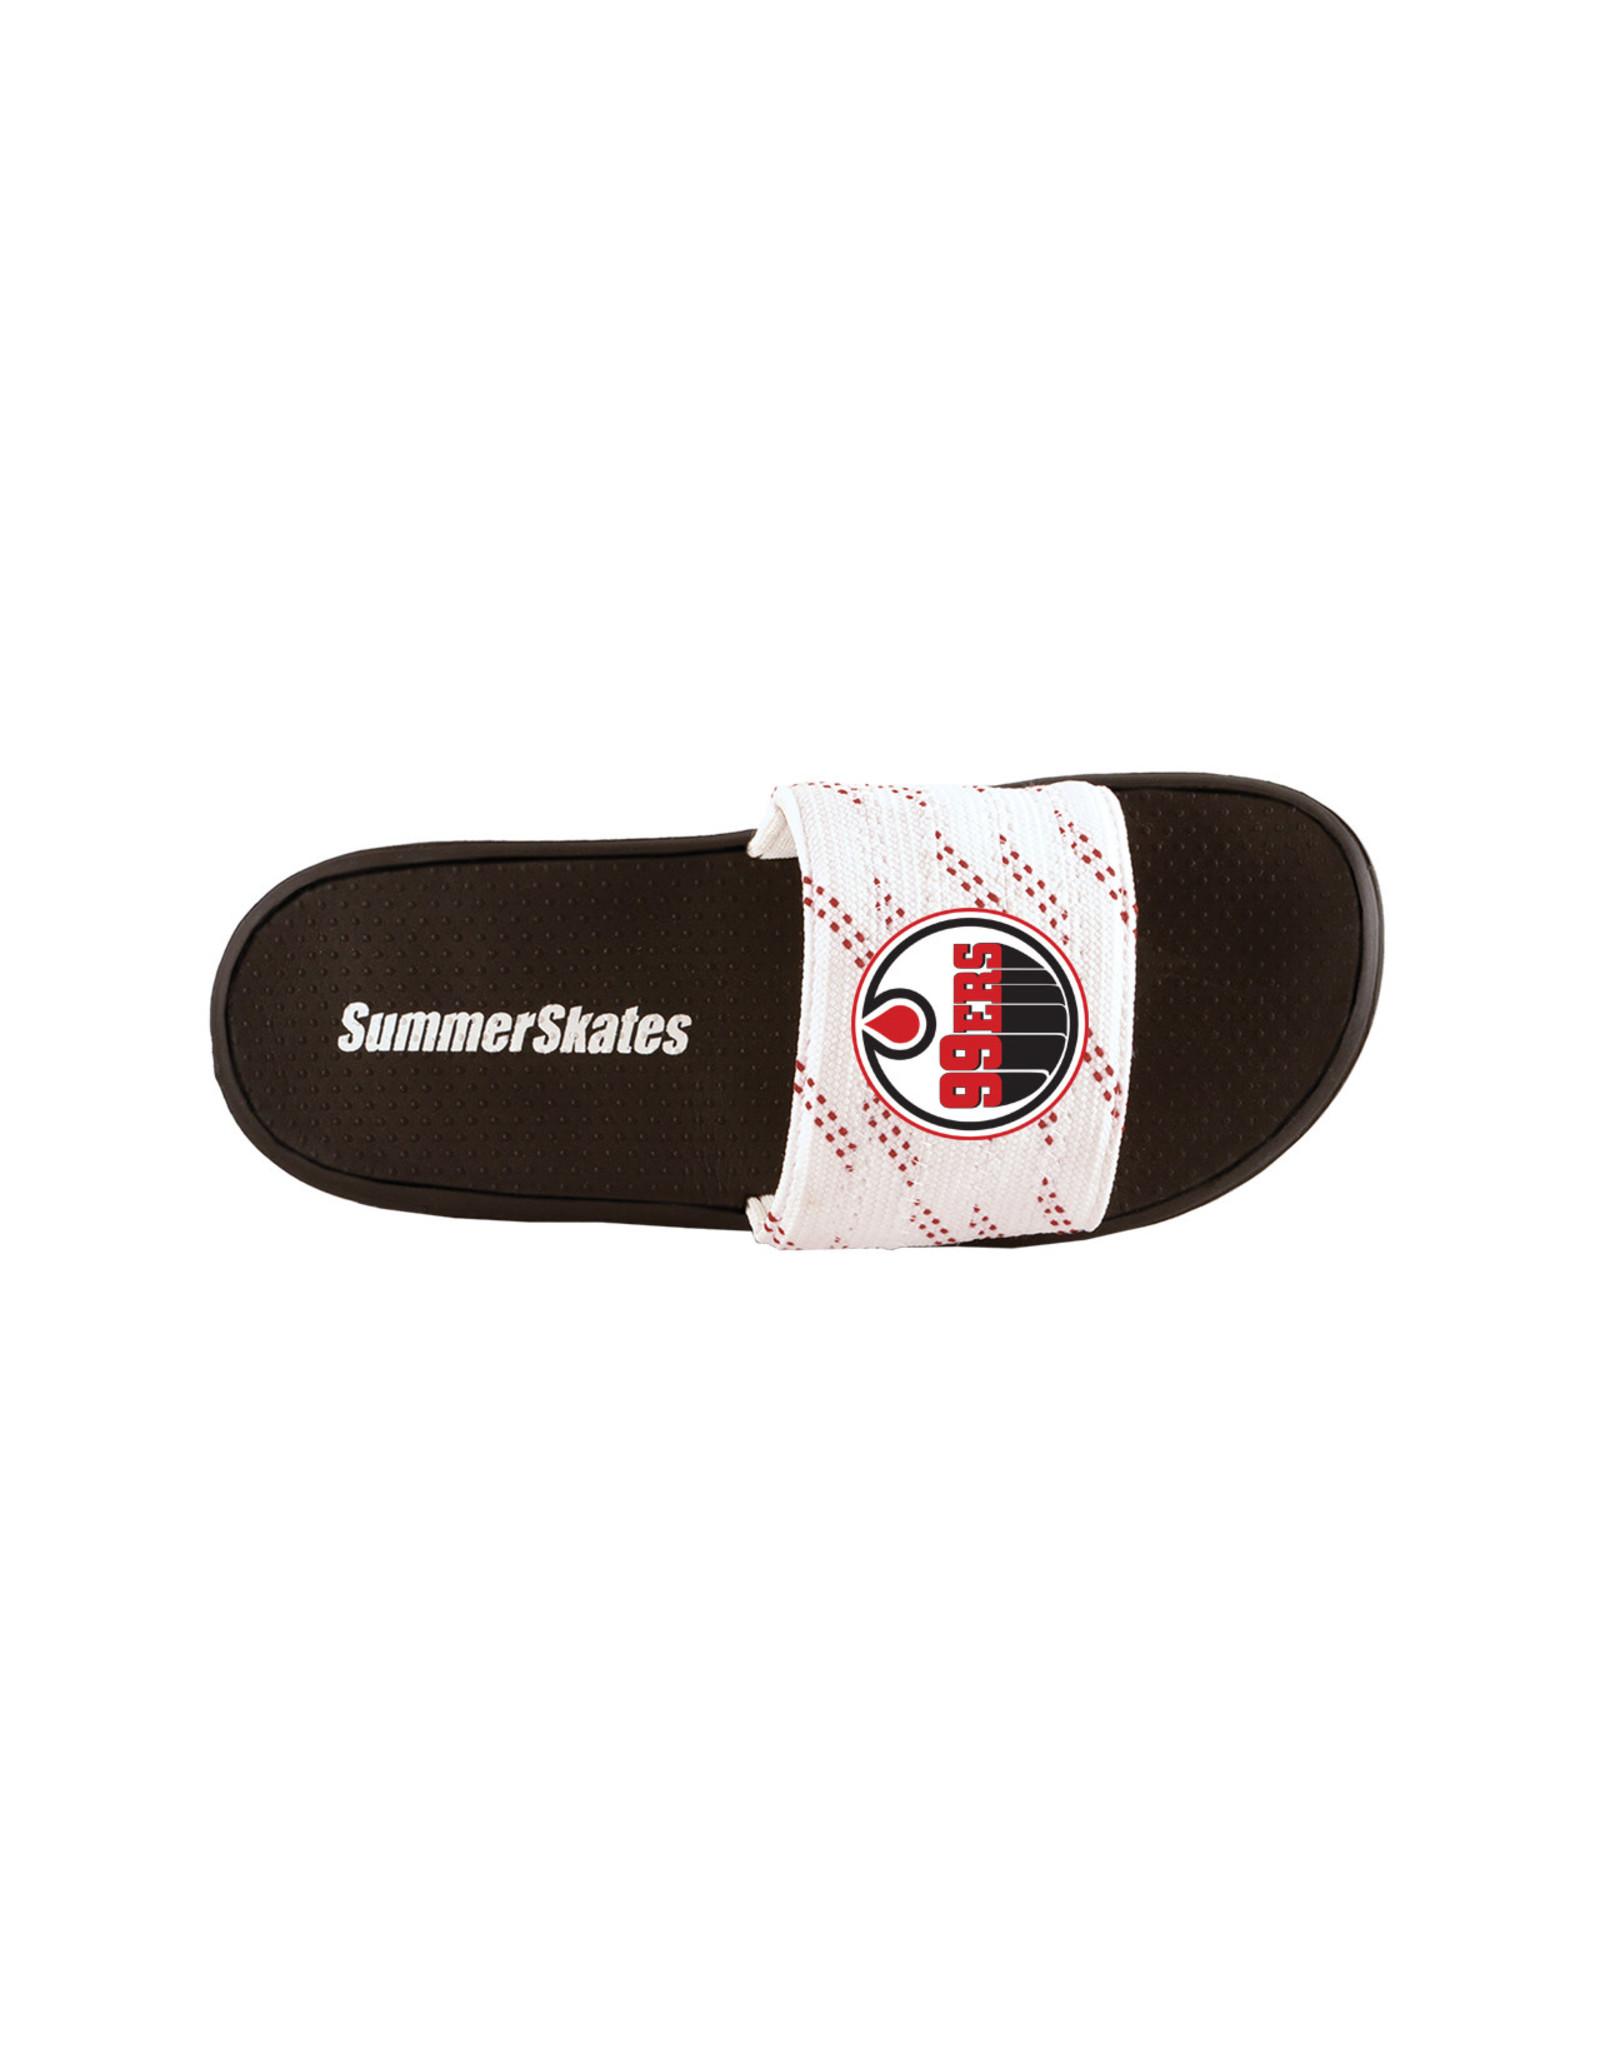 SUMMER SKATES CUSTOM SANDALS